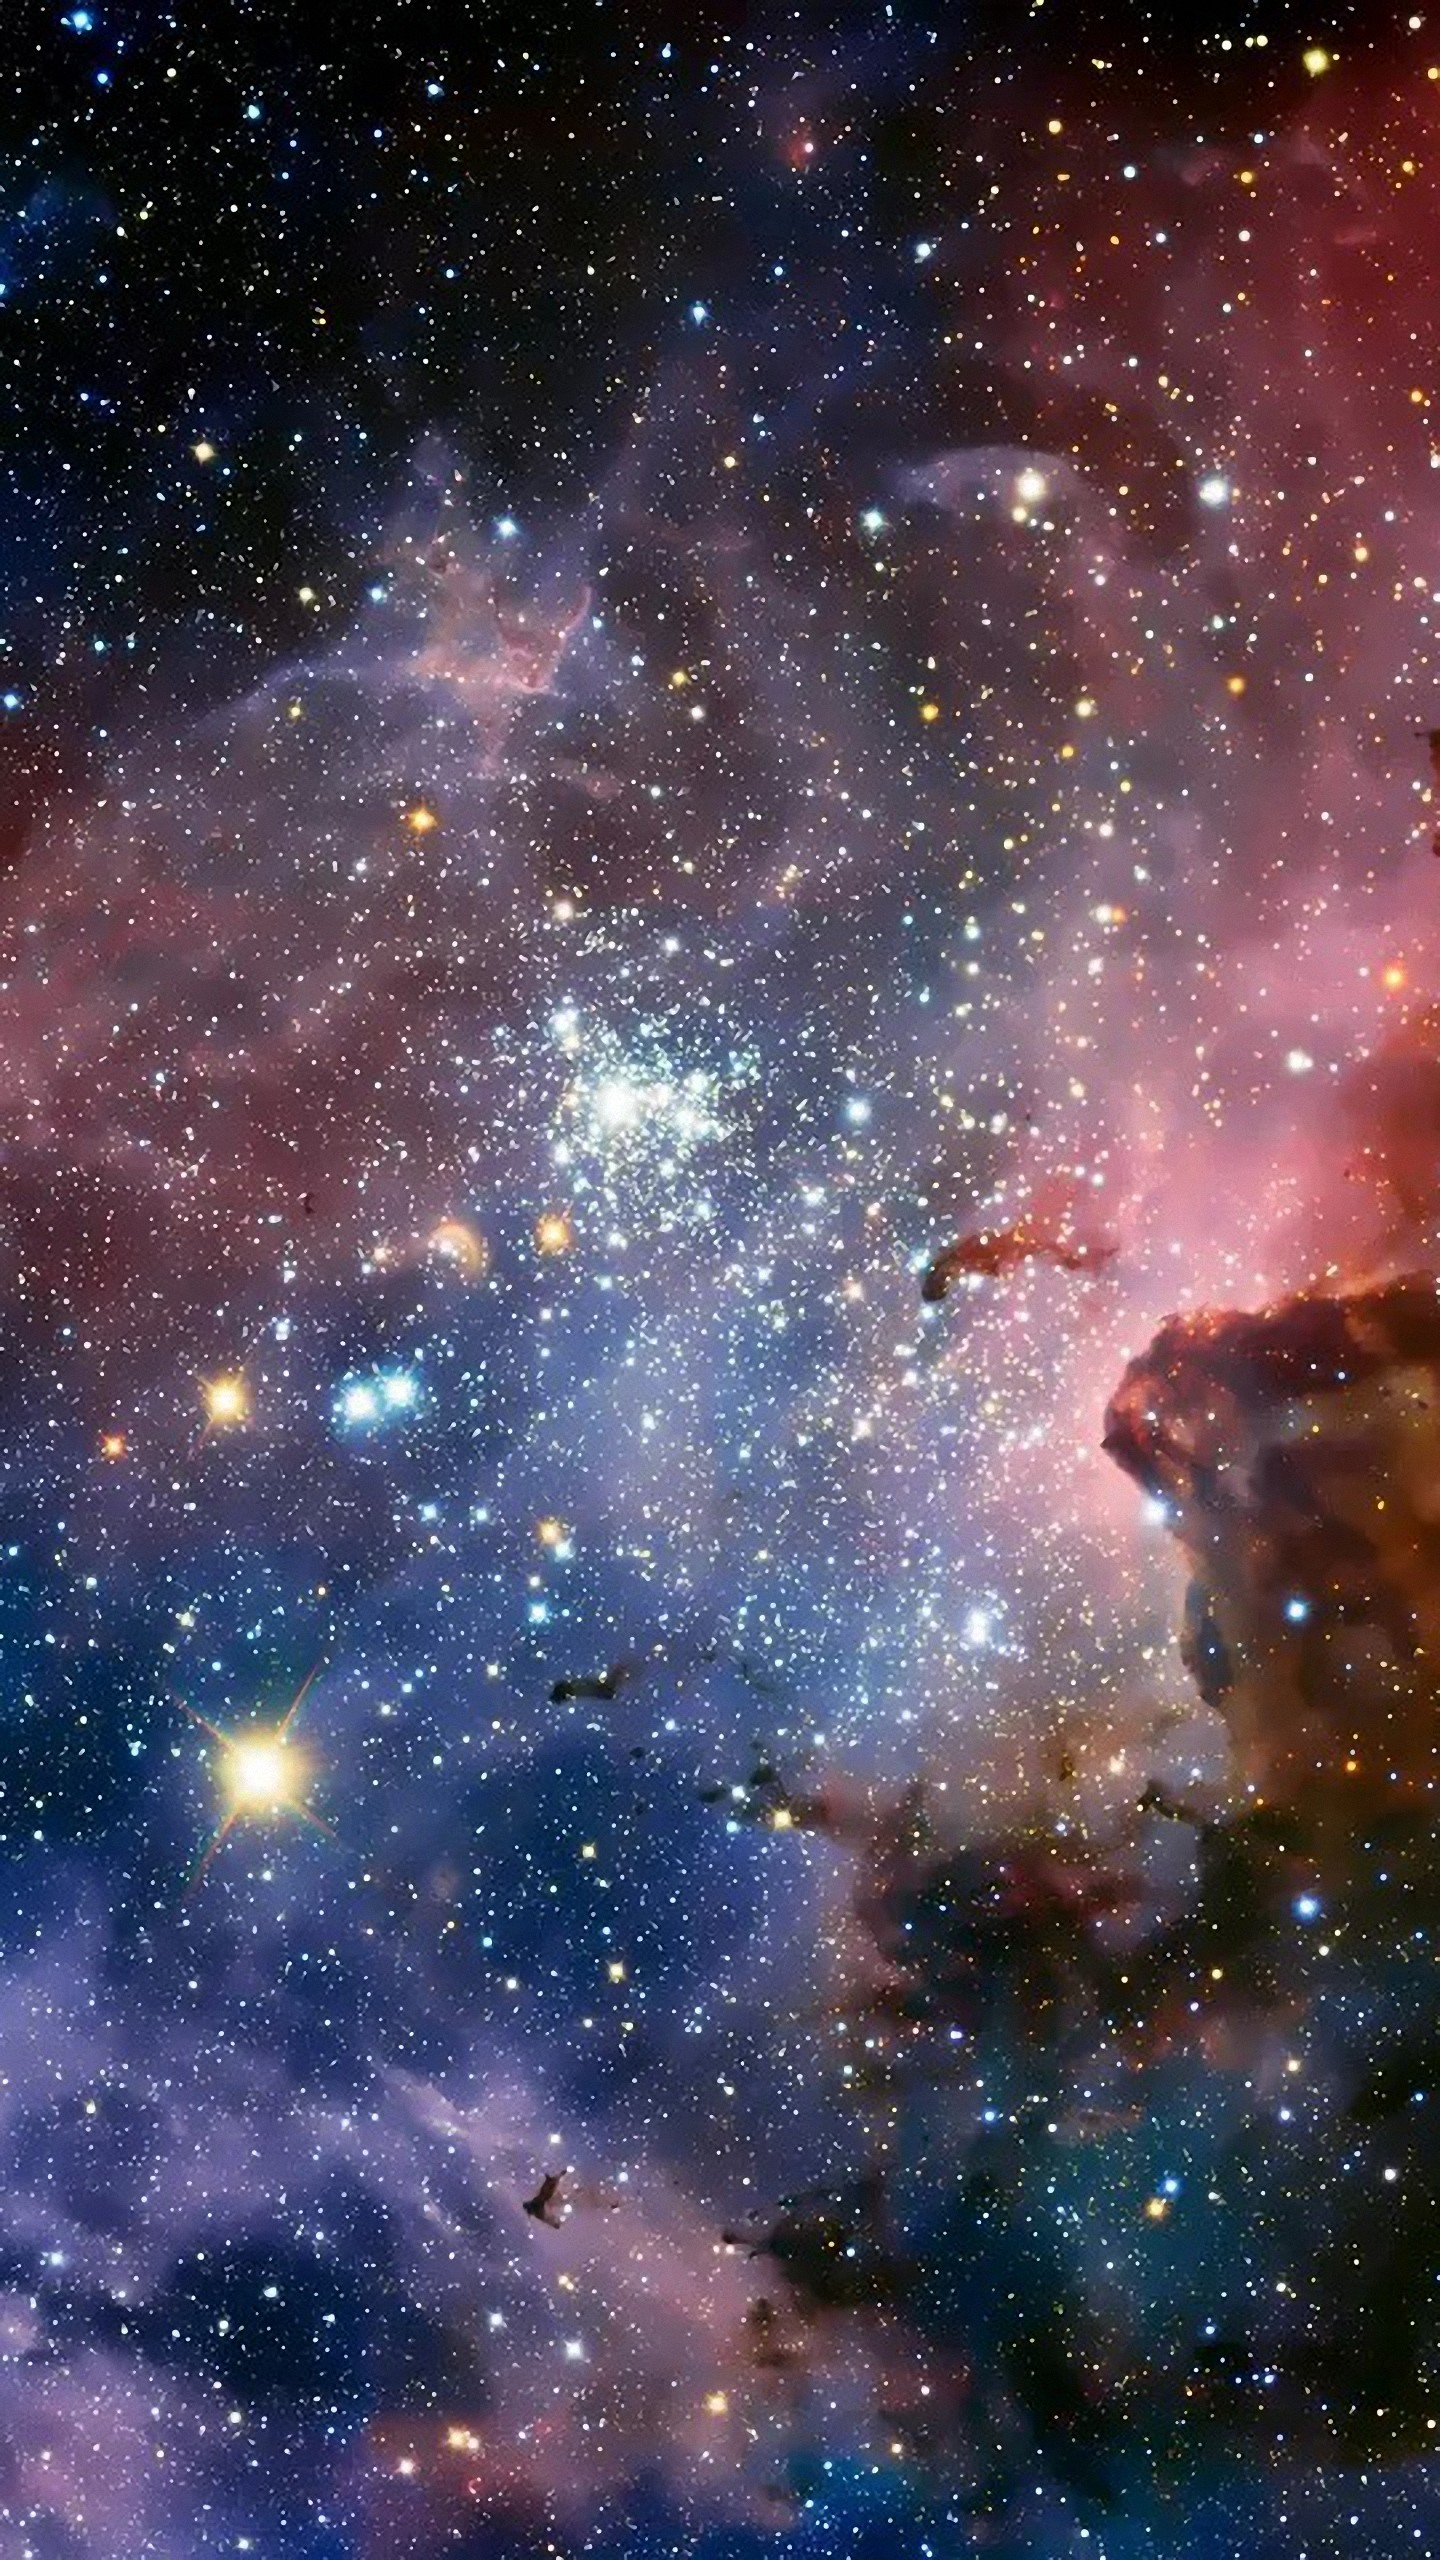 hubble telescope wallpaper desktop (59+ images)